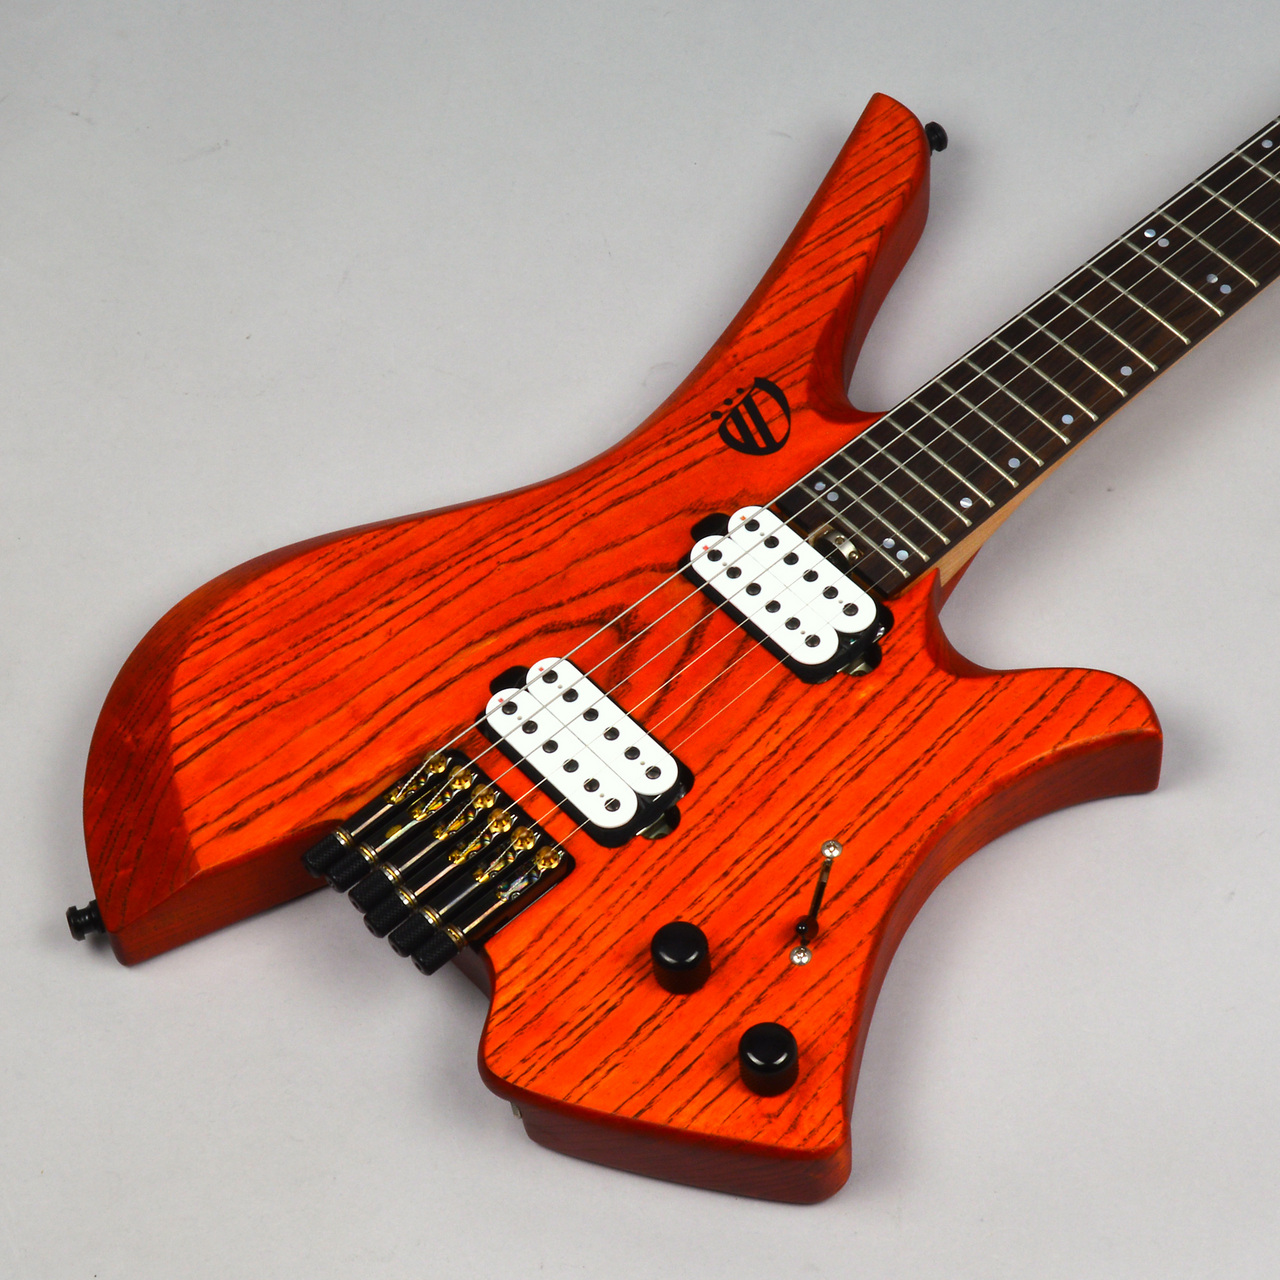 Overload Custom Guitars THEMIS6